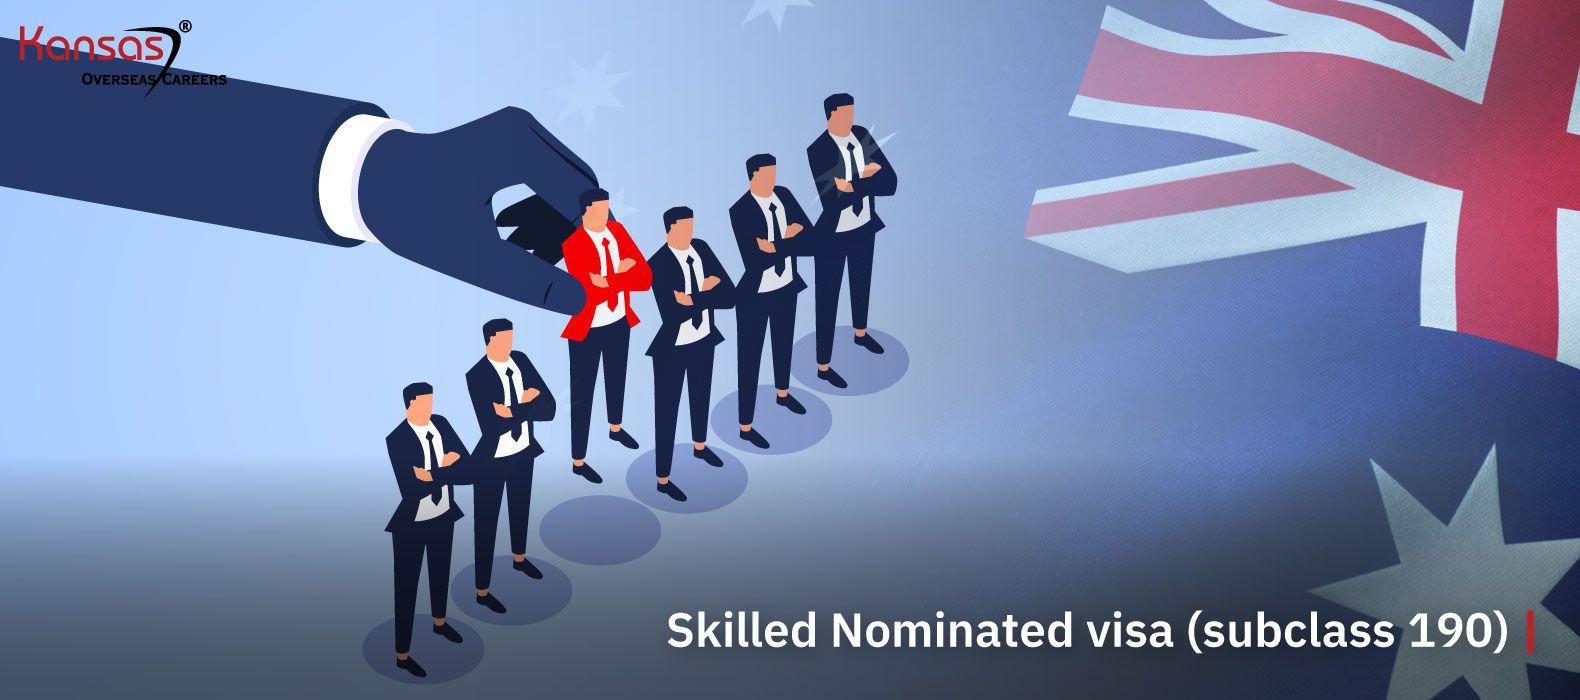 Skilled-Nominated-visa-(subclass-190)